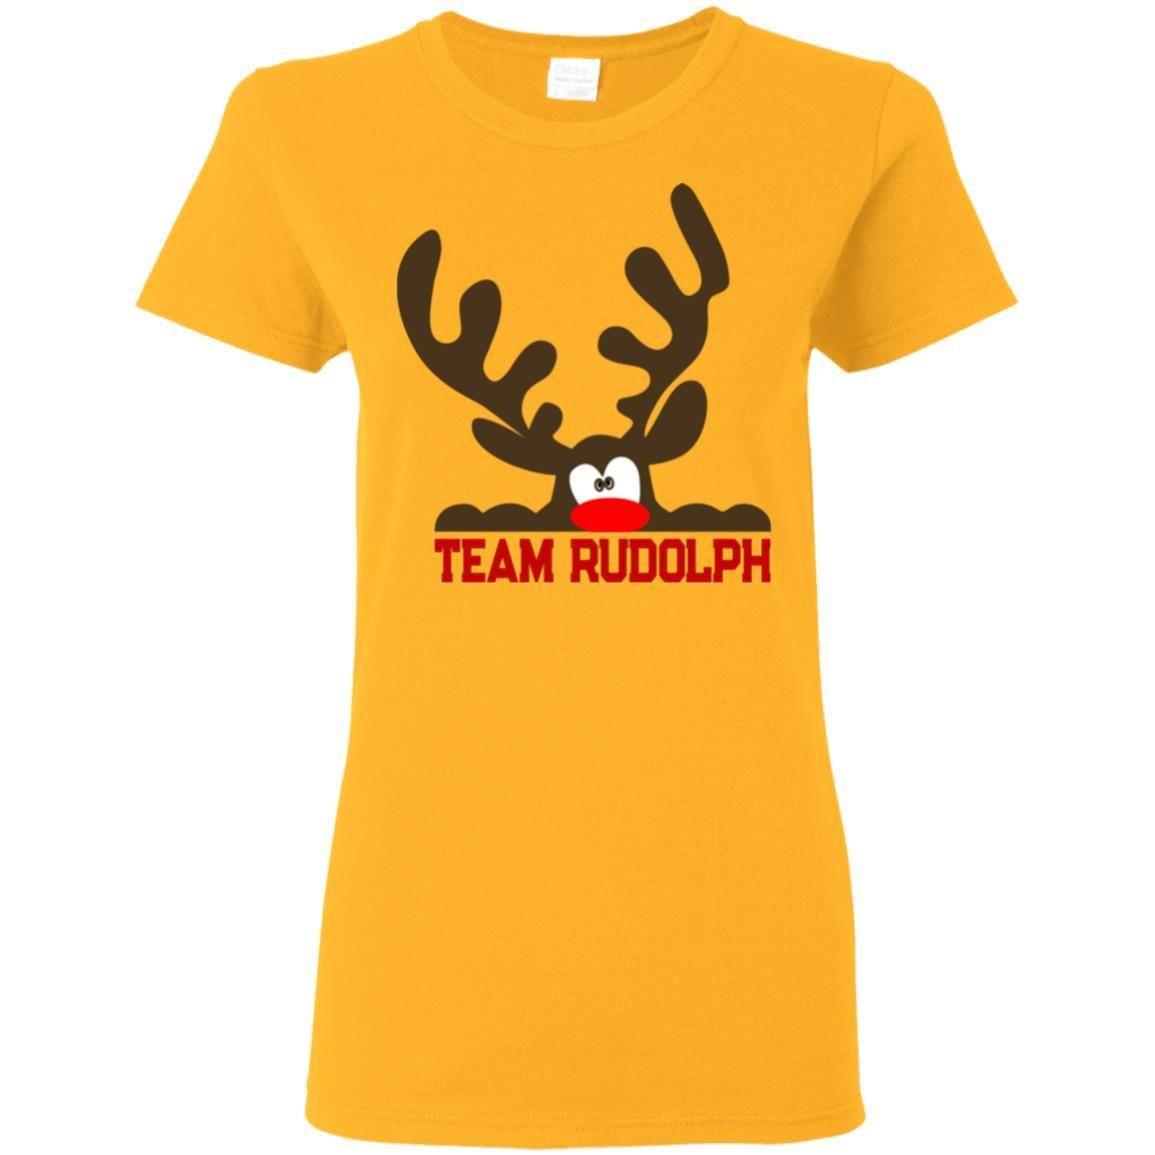 team rudolph funny christmas t shirt - Christmas Shirts Walmart